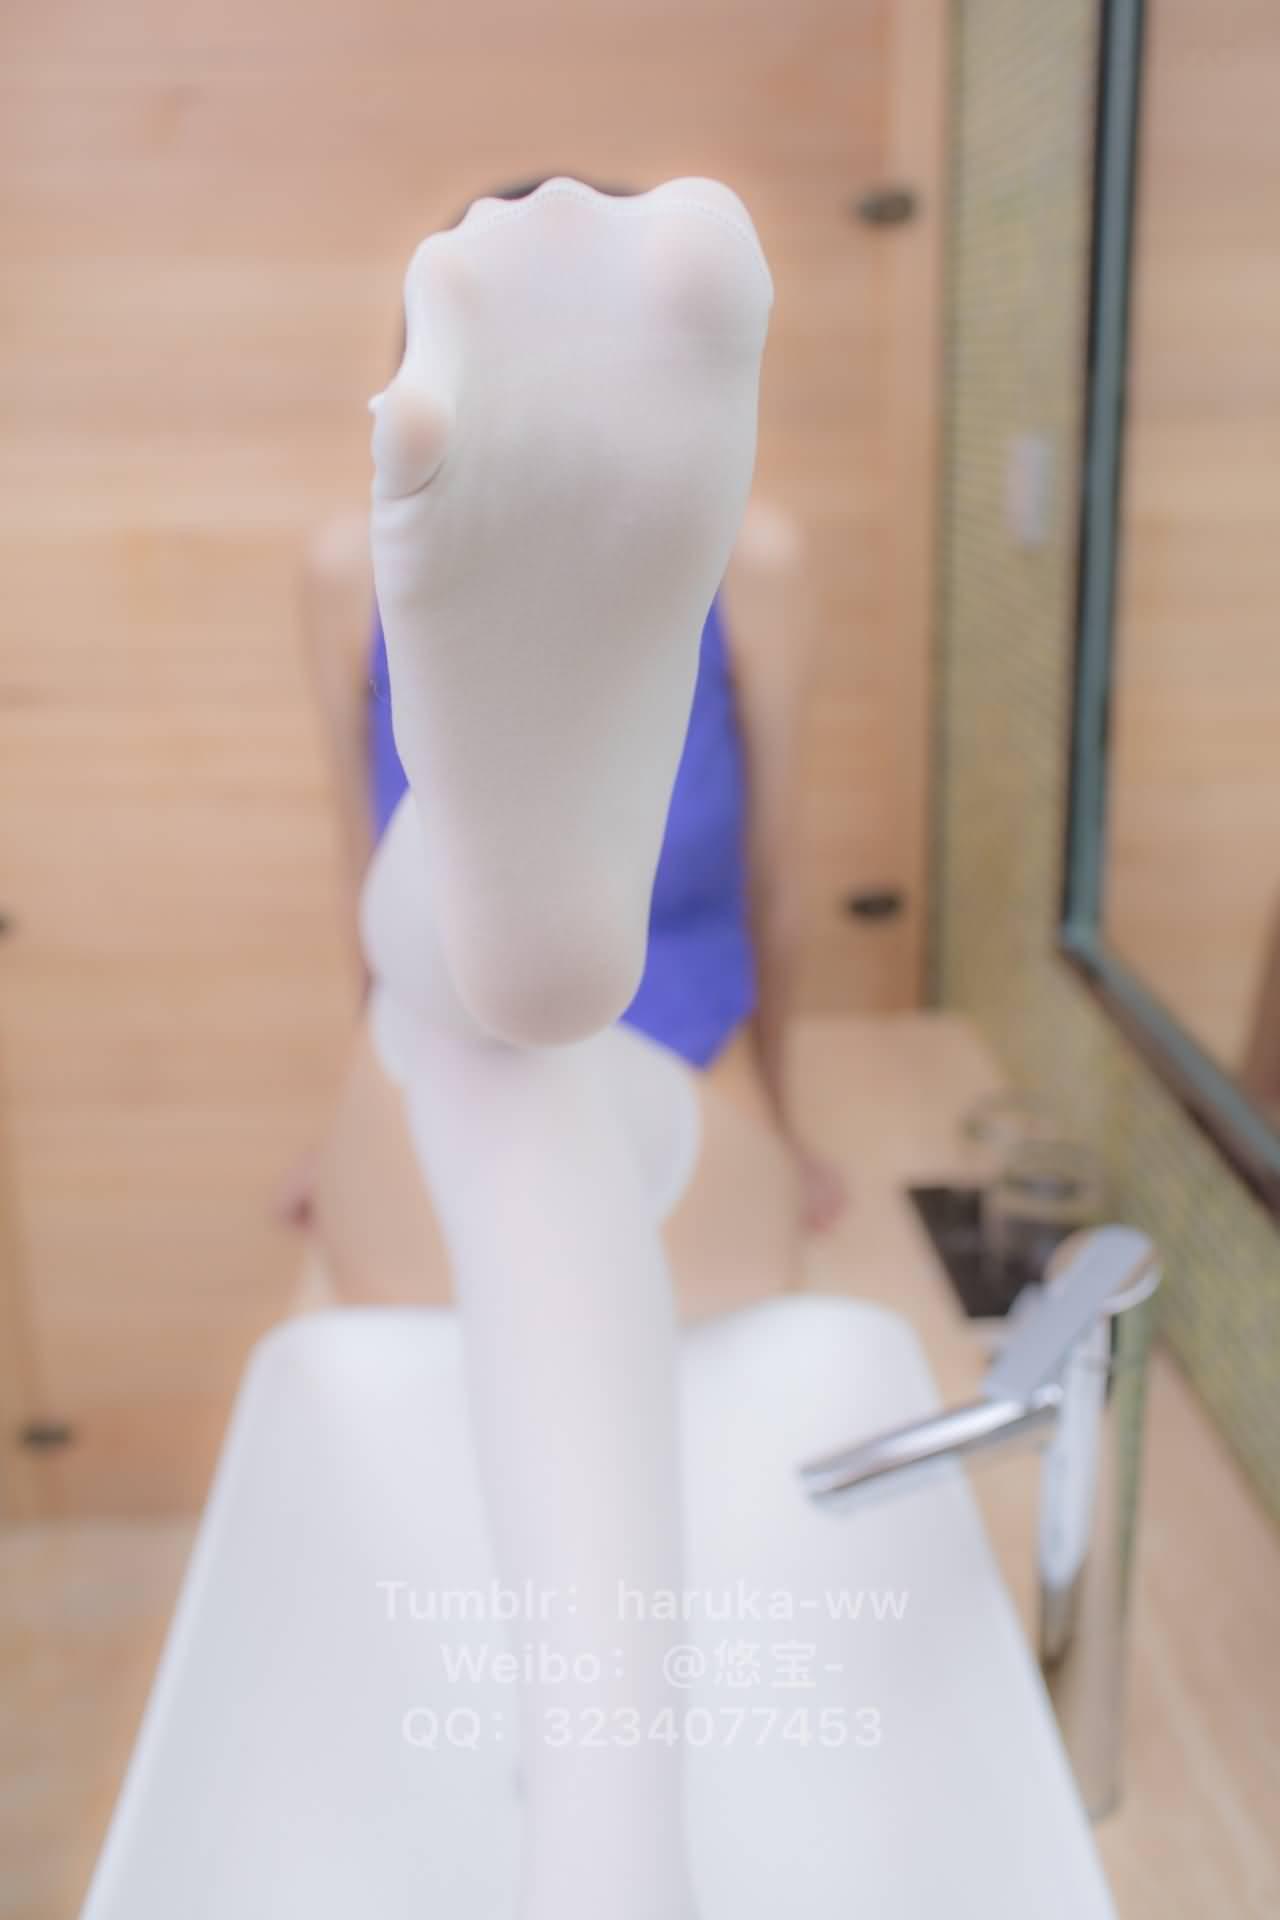 ryKG5N - Young japanese school girl white stockings cheongsam 悠宝三岁 白丝旗袍